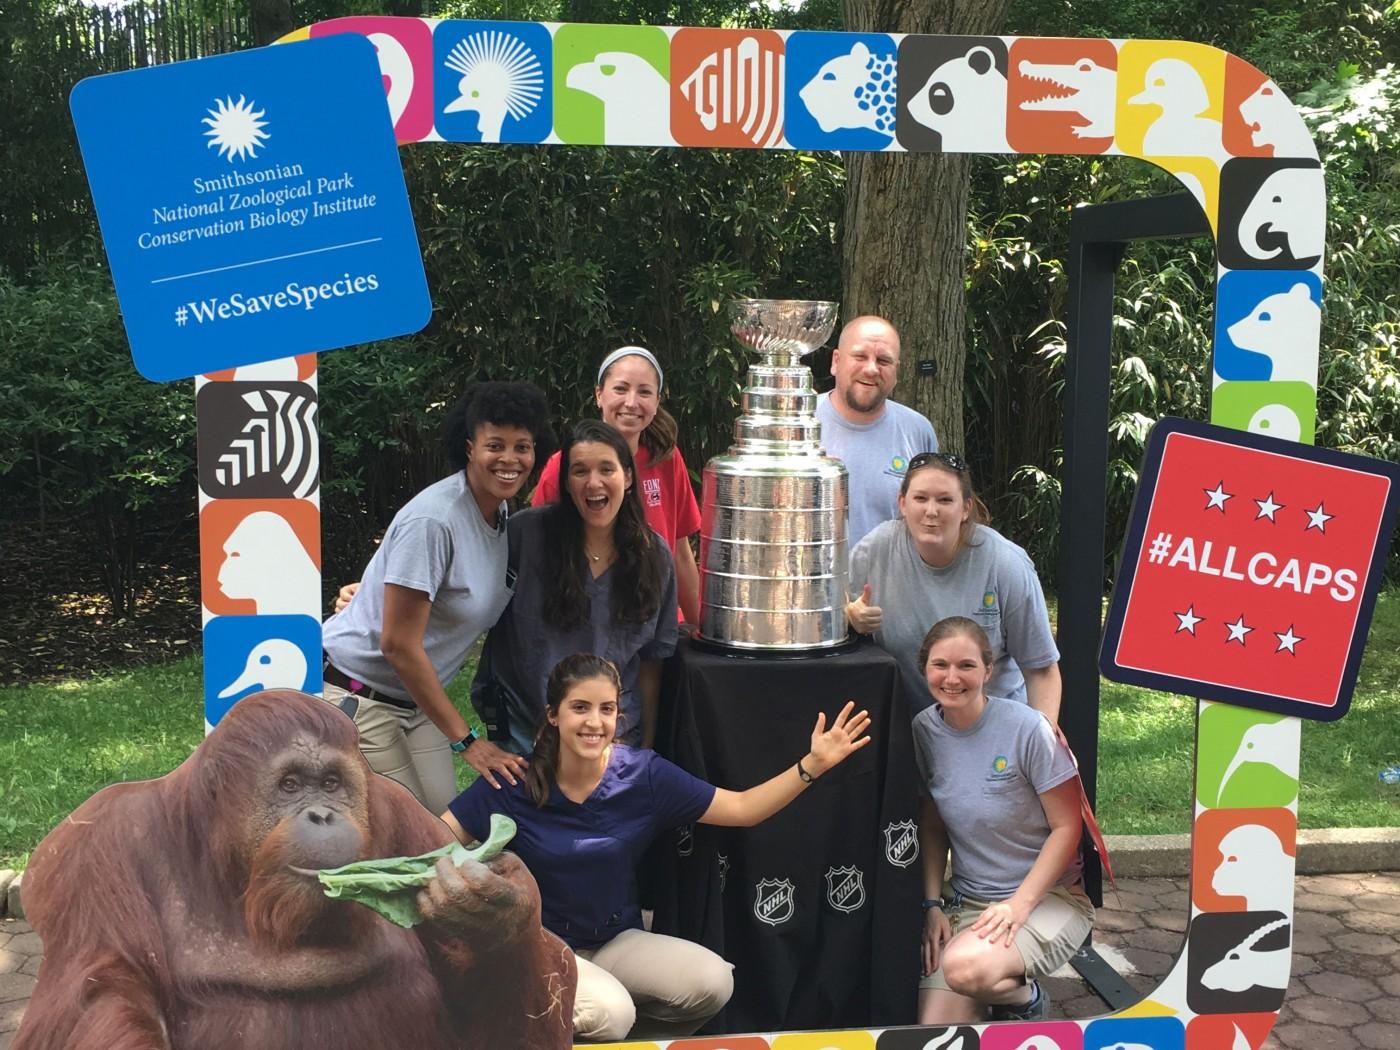 The Zoo Celebrates NHL Hockey Finals | Smithsonian's National Zoo